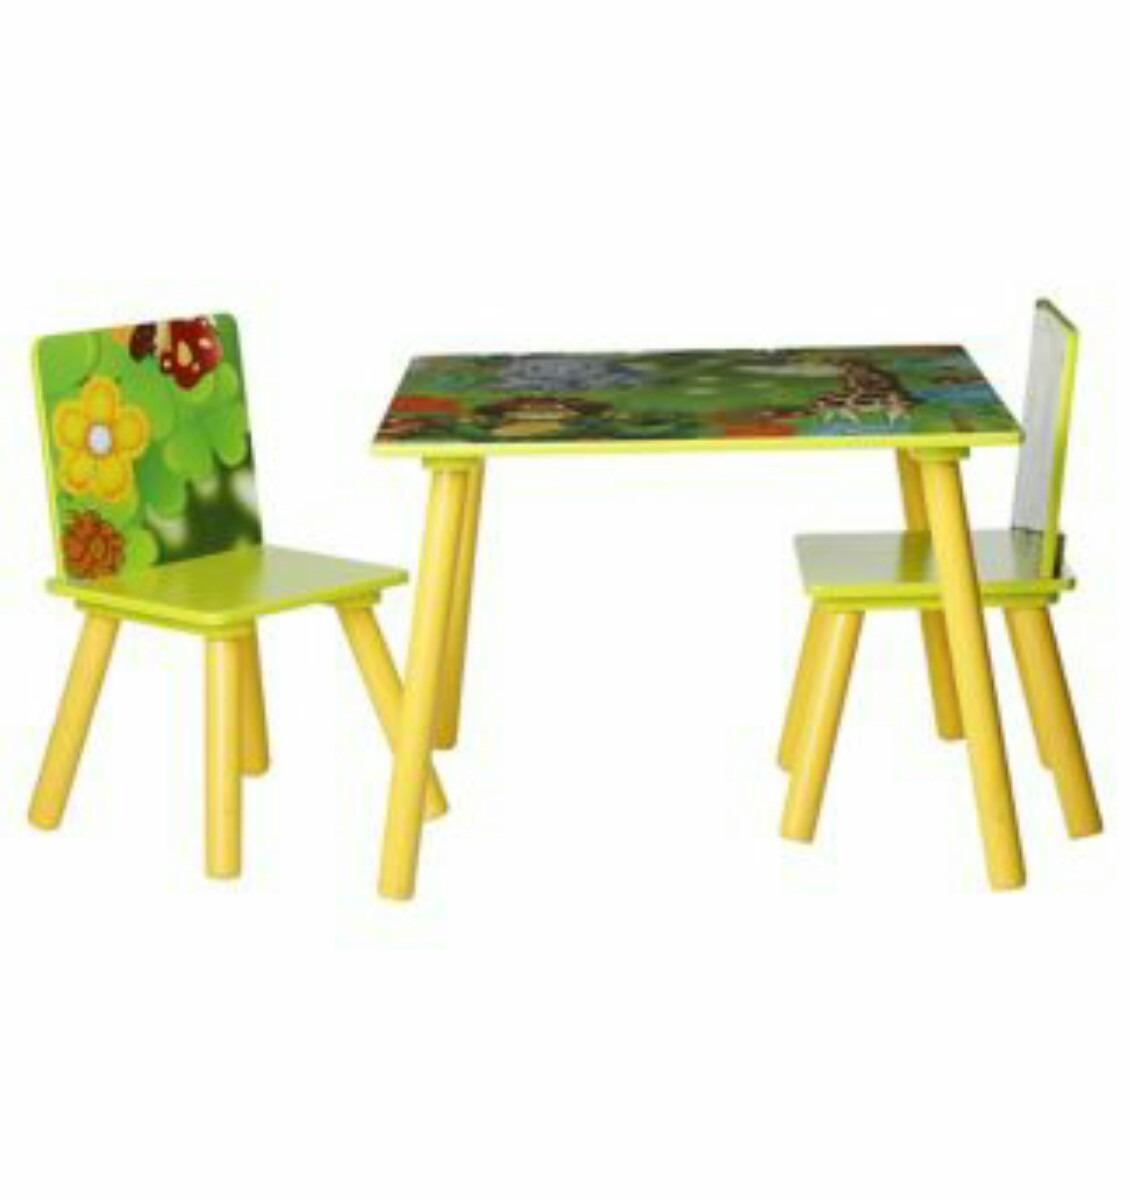 Mesa Niños Con 2 Sillas Selva/plasticos Morija - $ 64.900 en Mercado ...